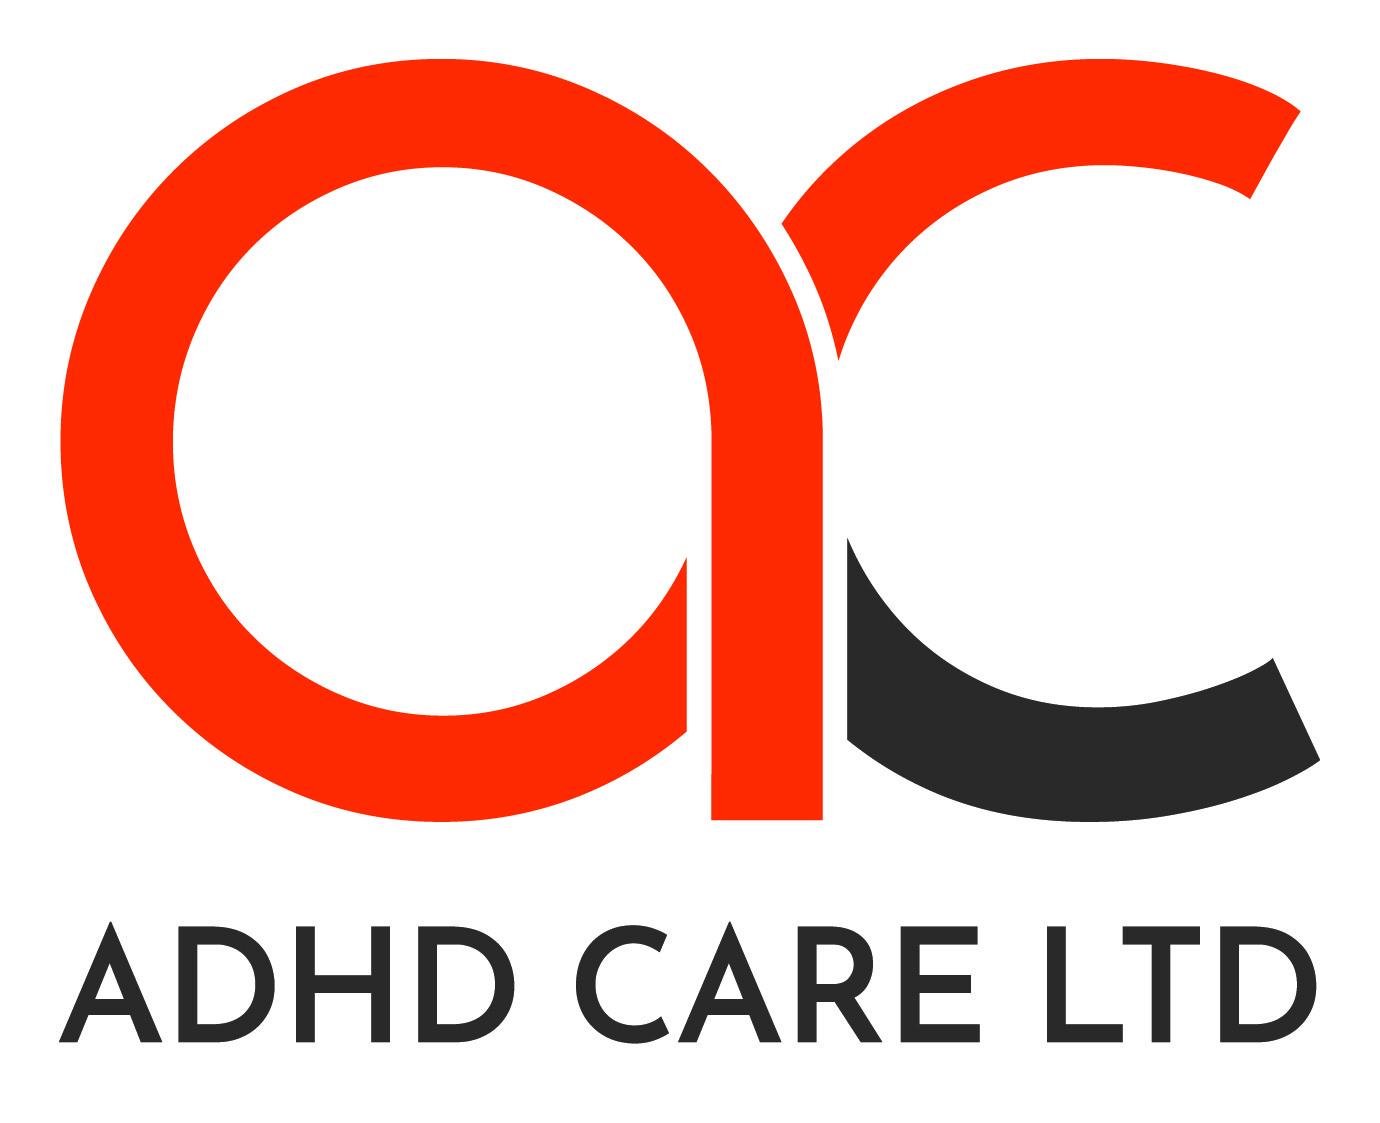 ADHD CARE LTD company logo